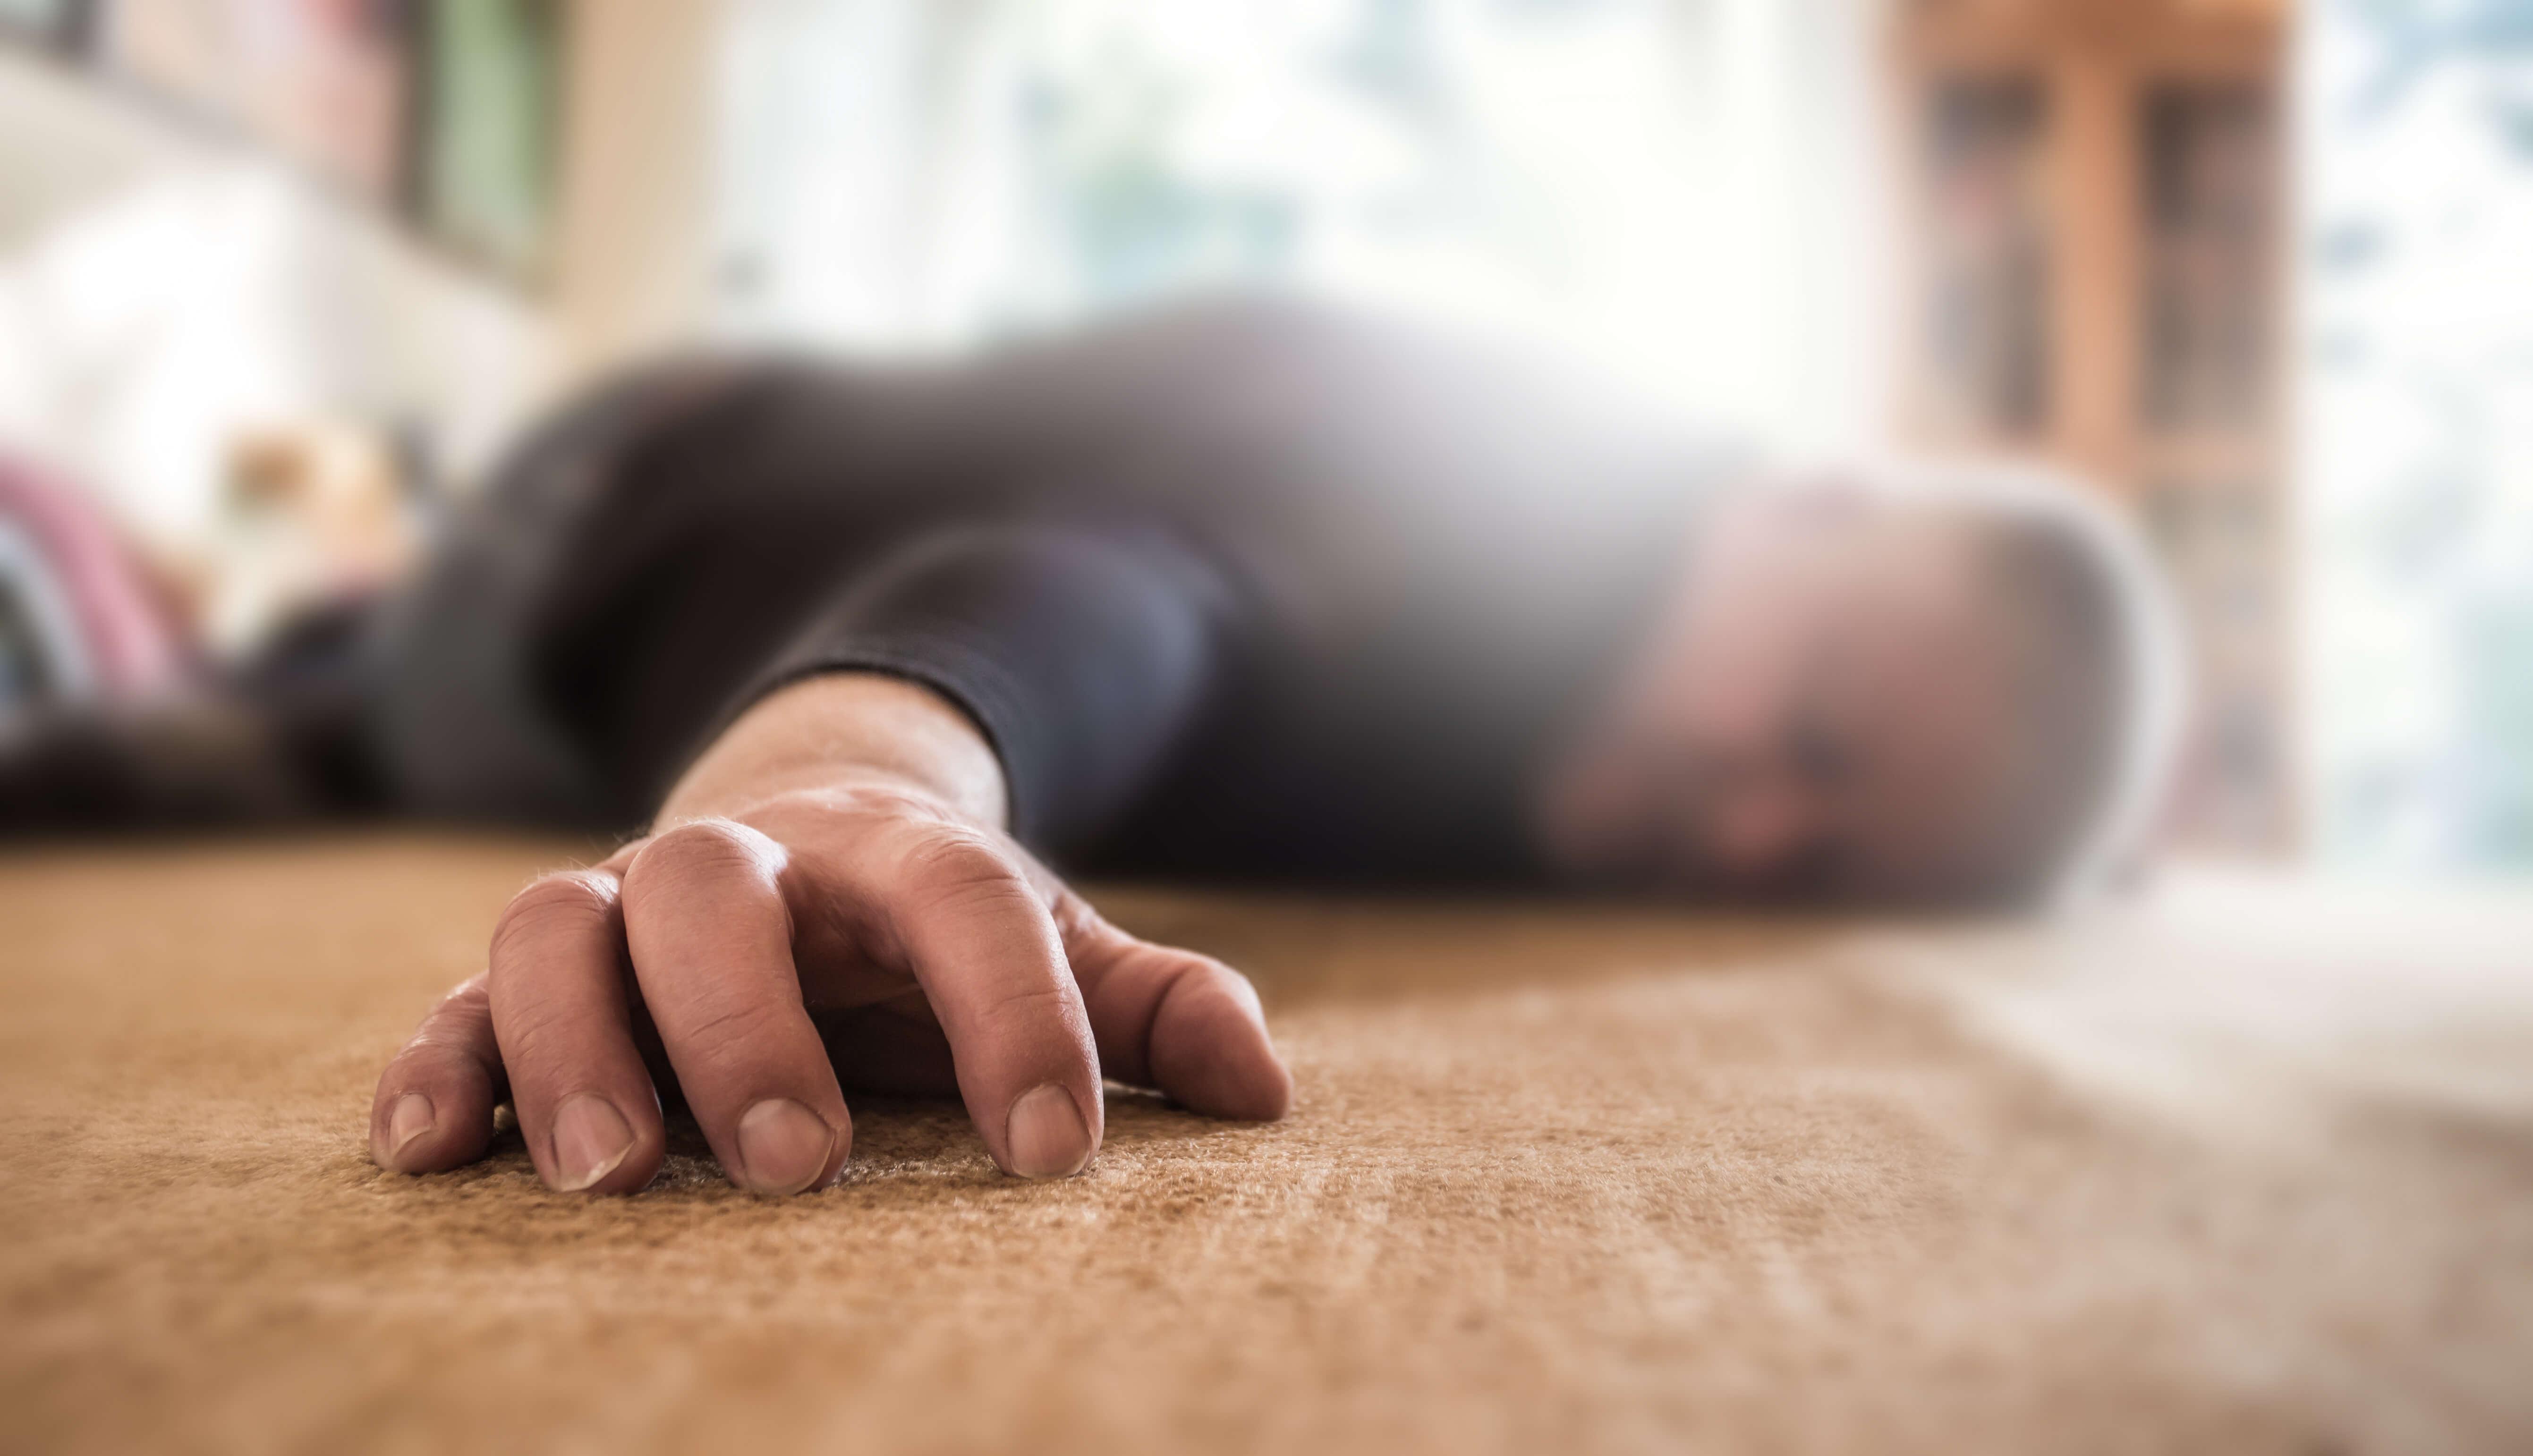 man collapsed on floor